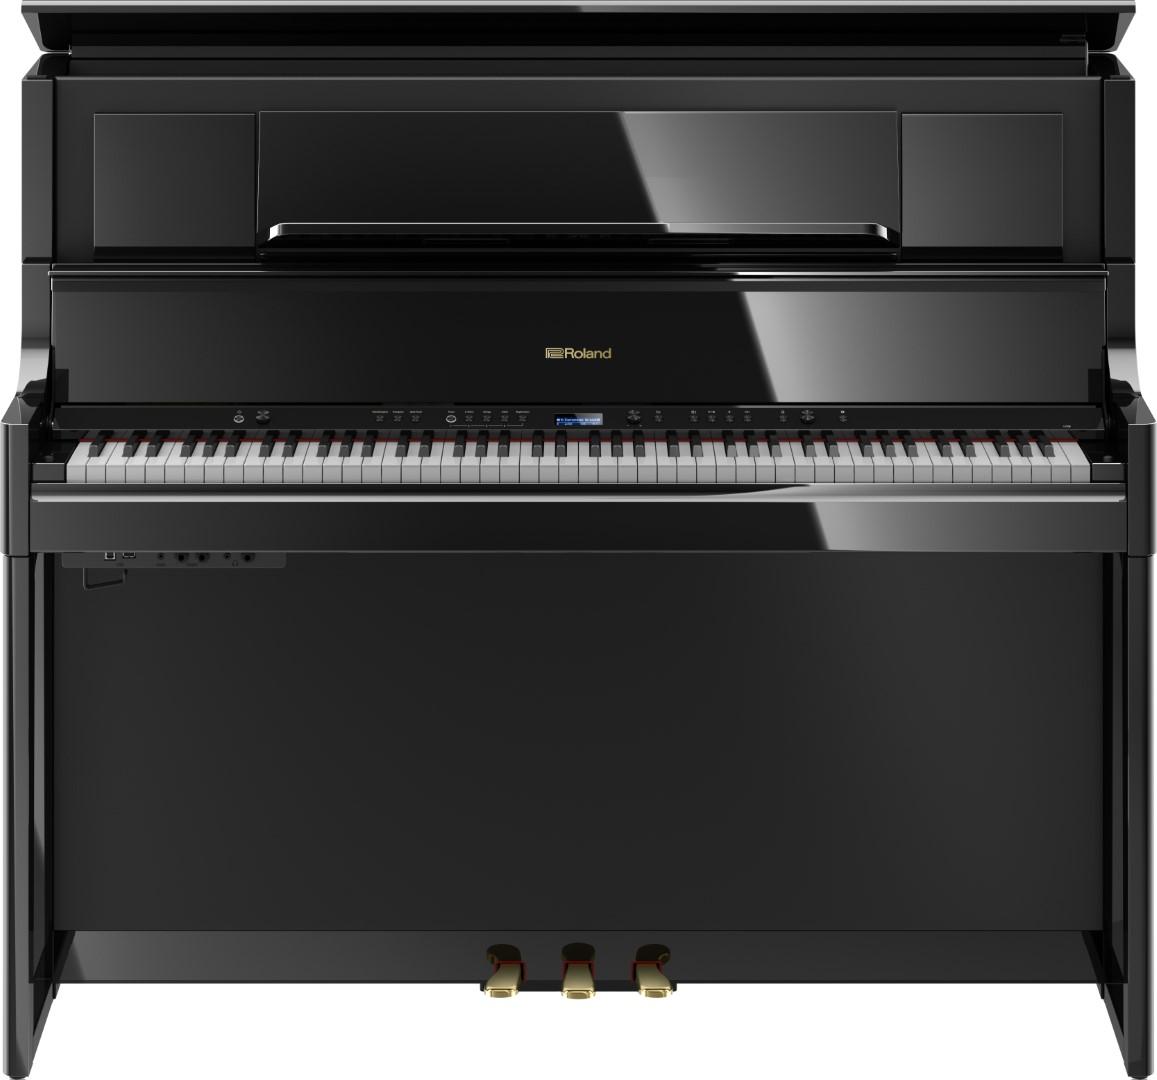 Roland Digital Piano Glasgow : roland lx708 digital piano digital pianos ~ Russianpoet.info Haus und Dekorationen